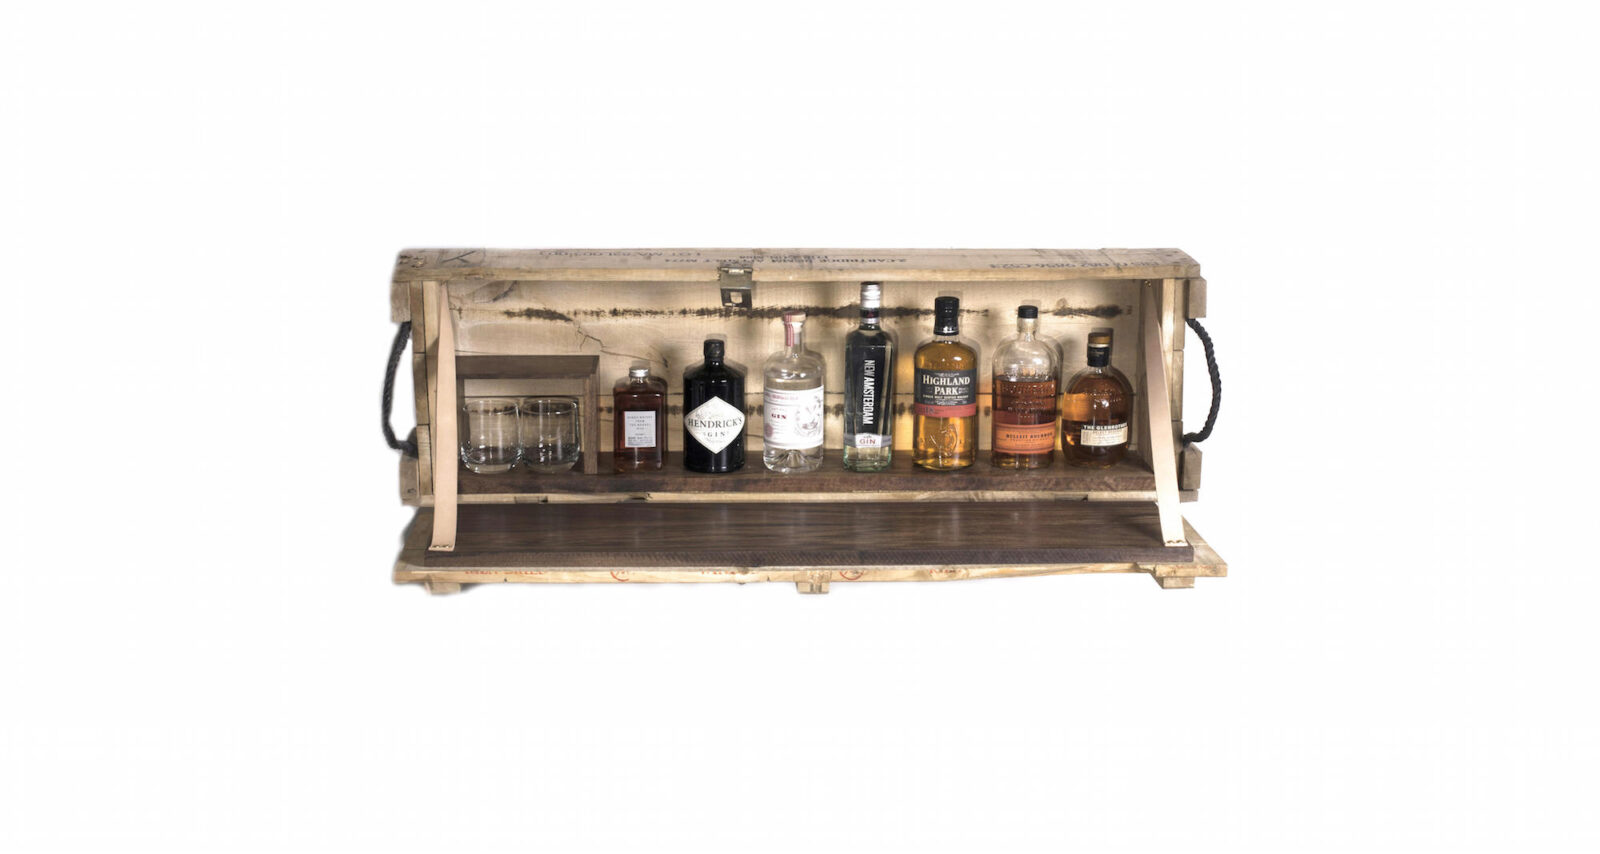 Bomb Bar 1600x854 - The Bomb Bar